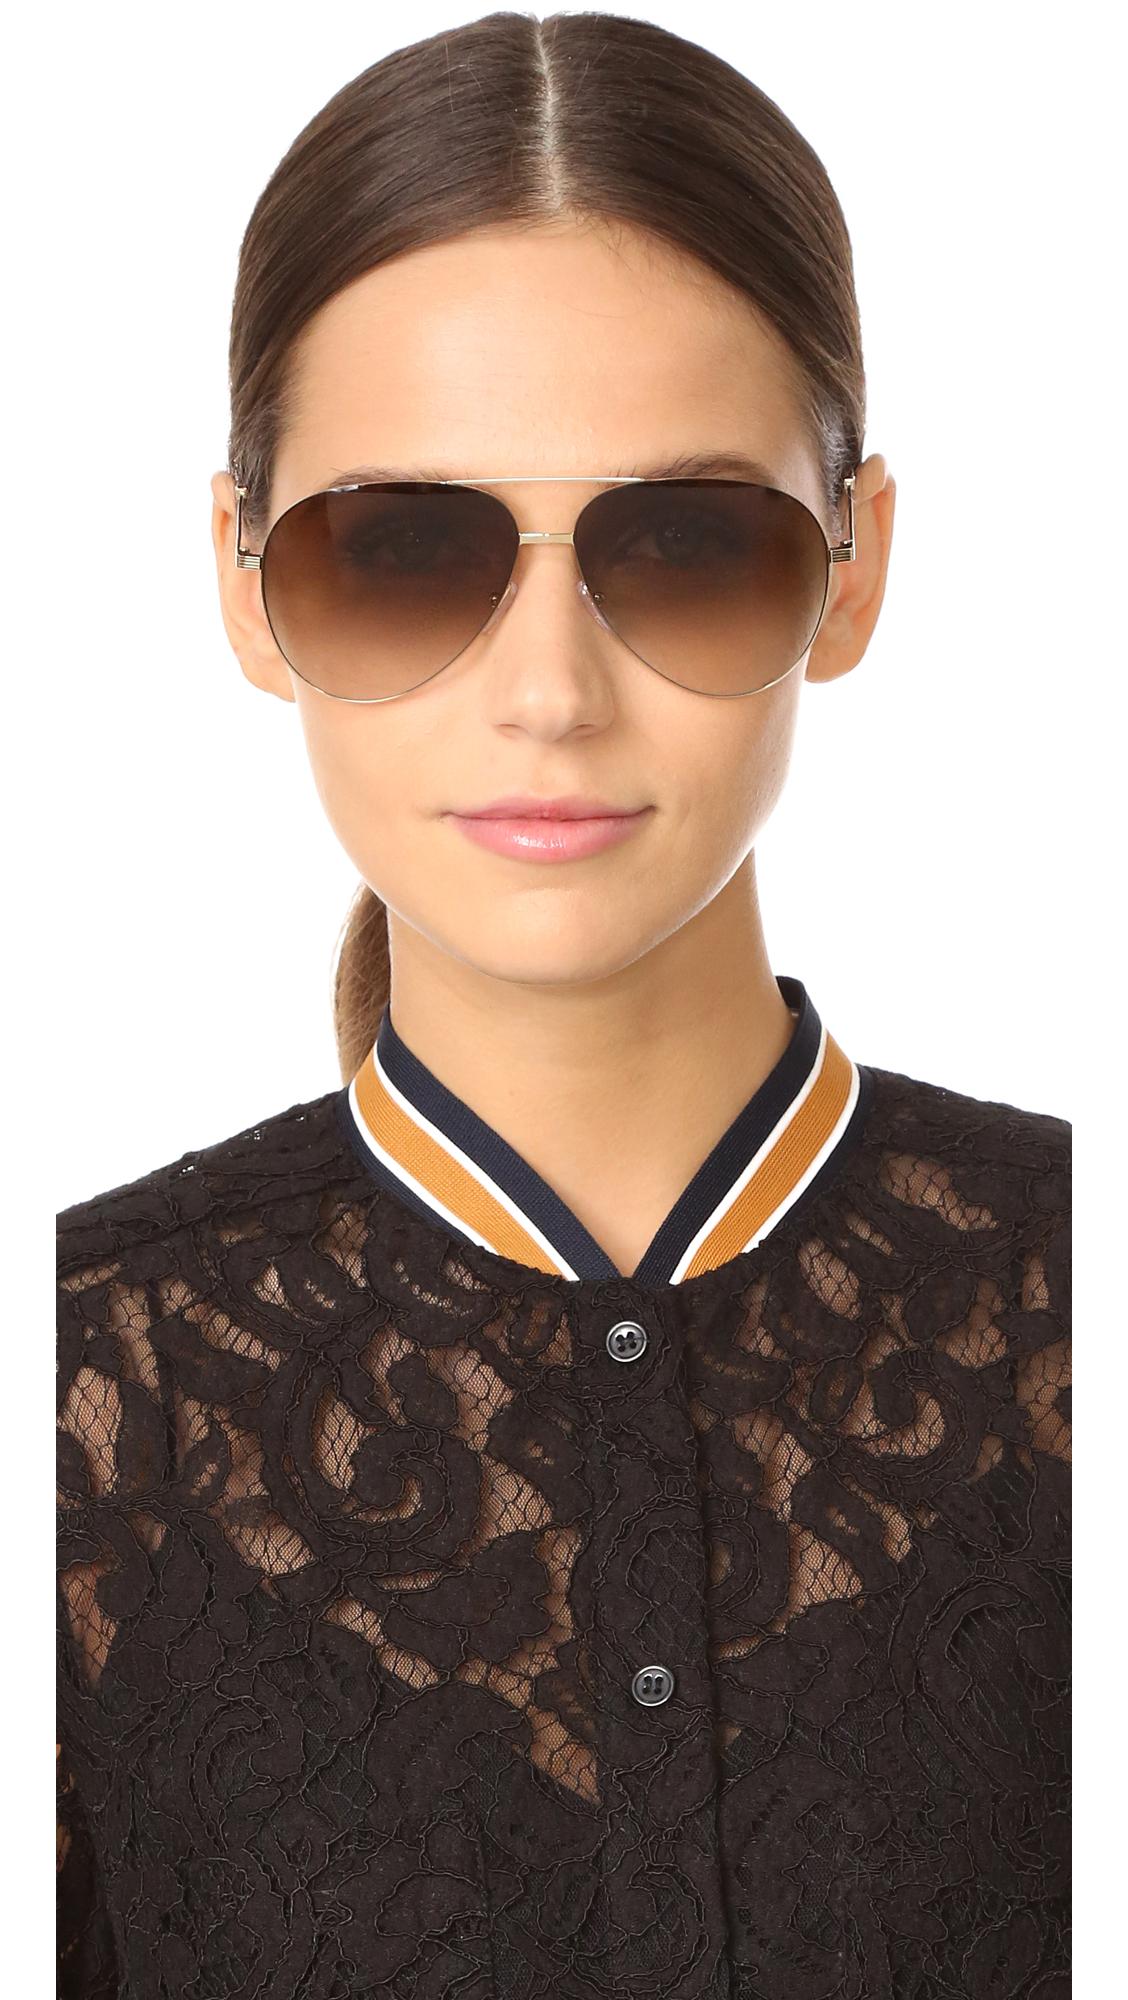 c274d3858002d Victoria Beckham Classic Victoria Feather Light Aviator Sunglasses ...